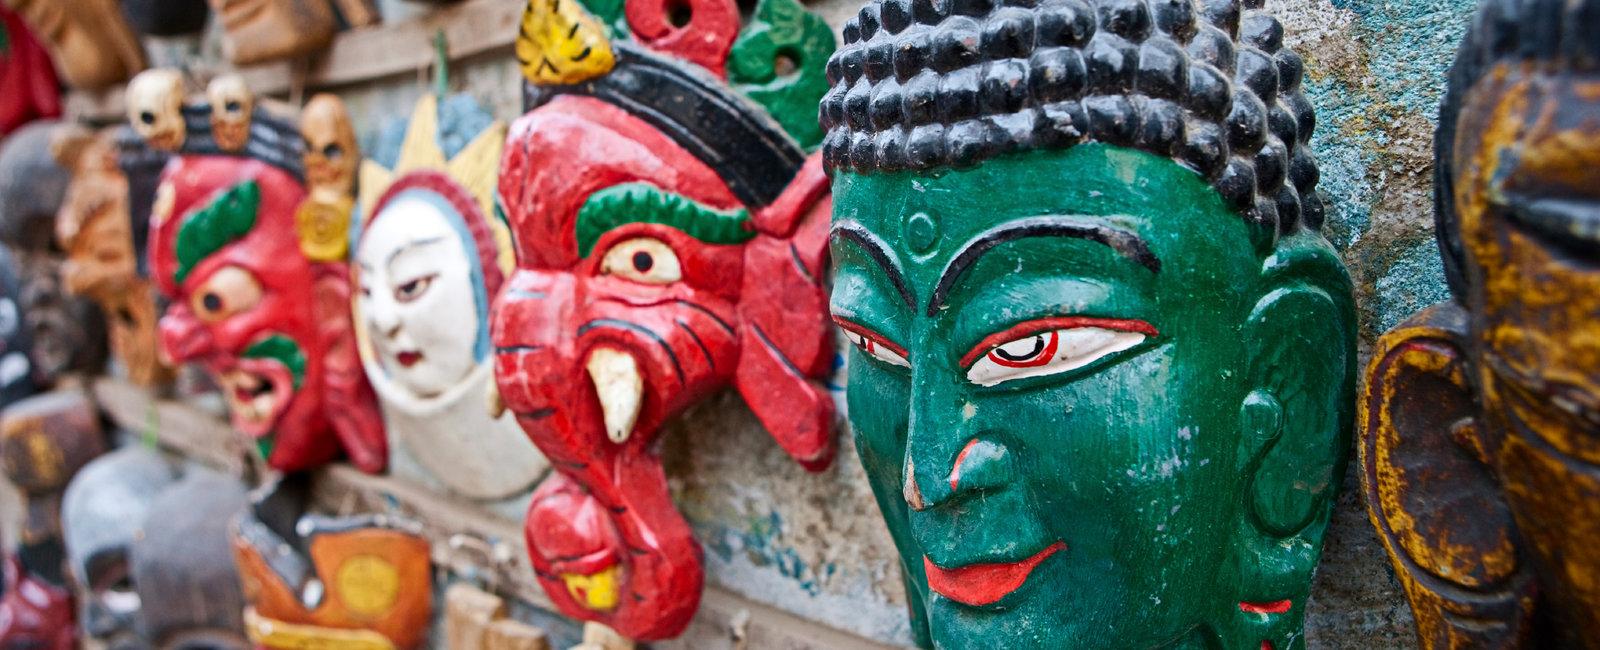 Graham Wong - Dentistry Electives in Kathmandu, Nepal